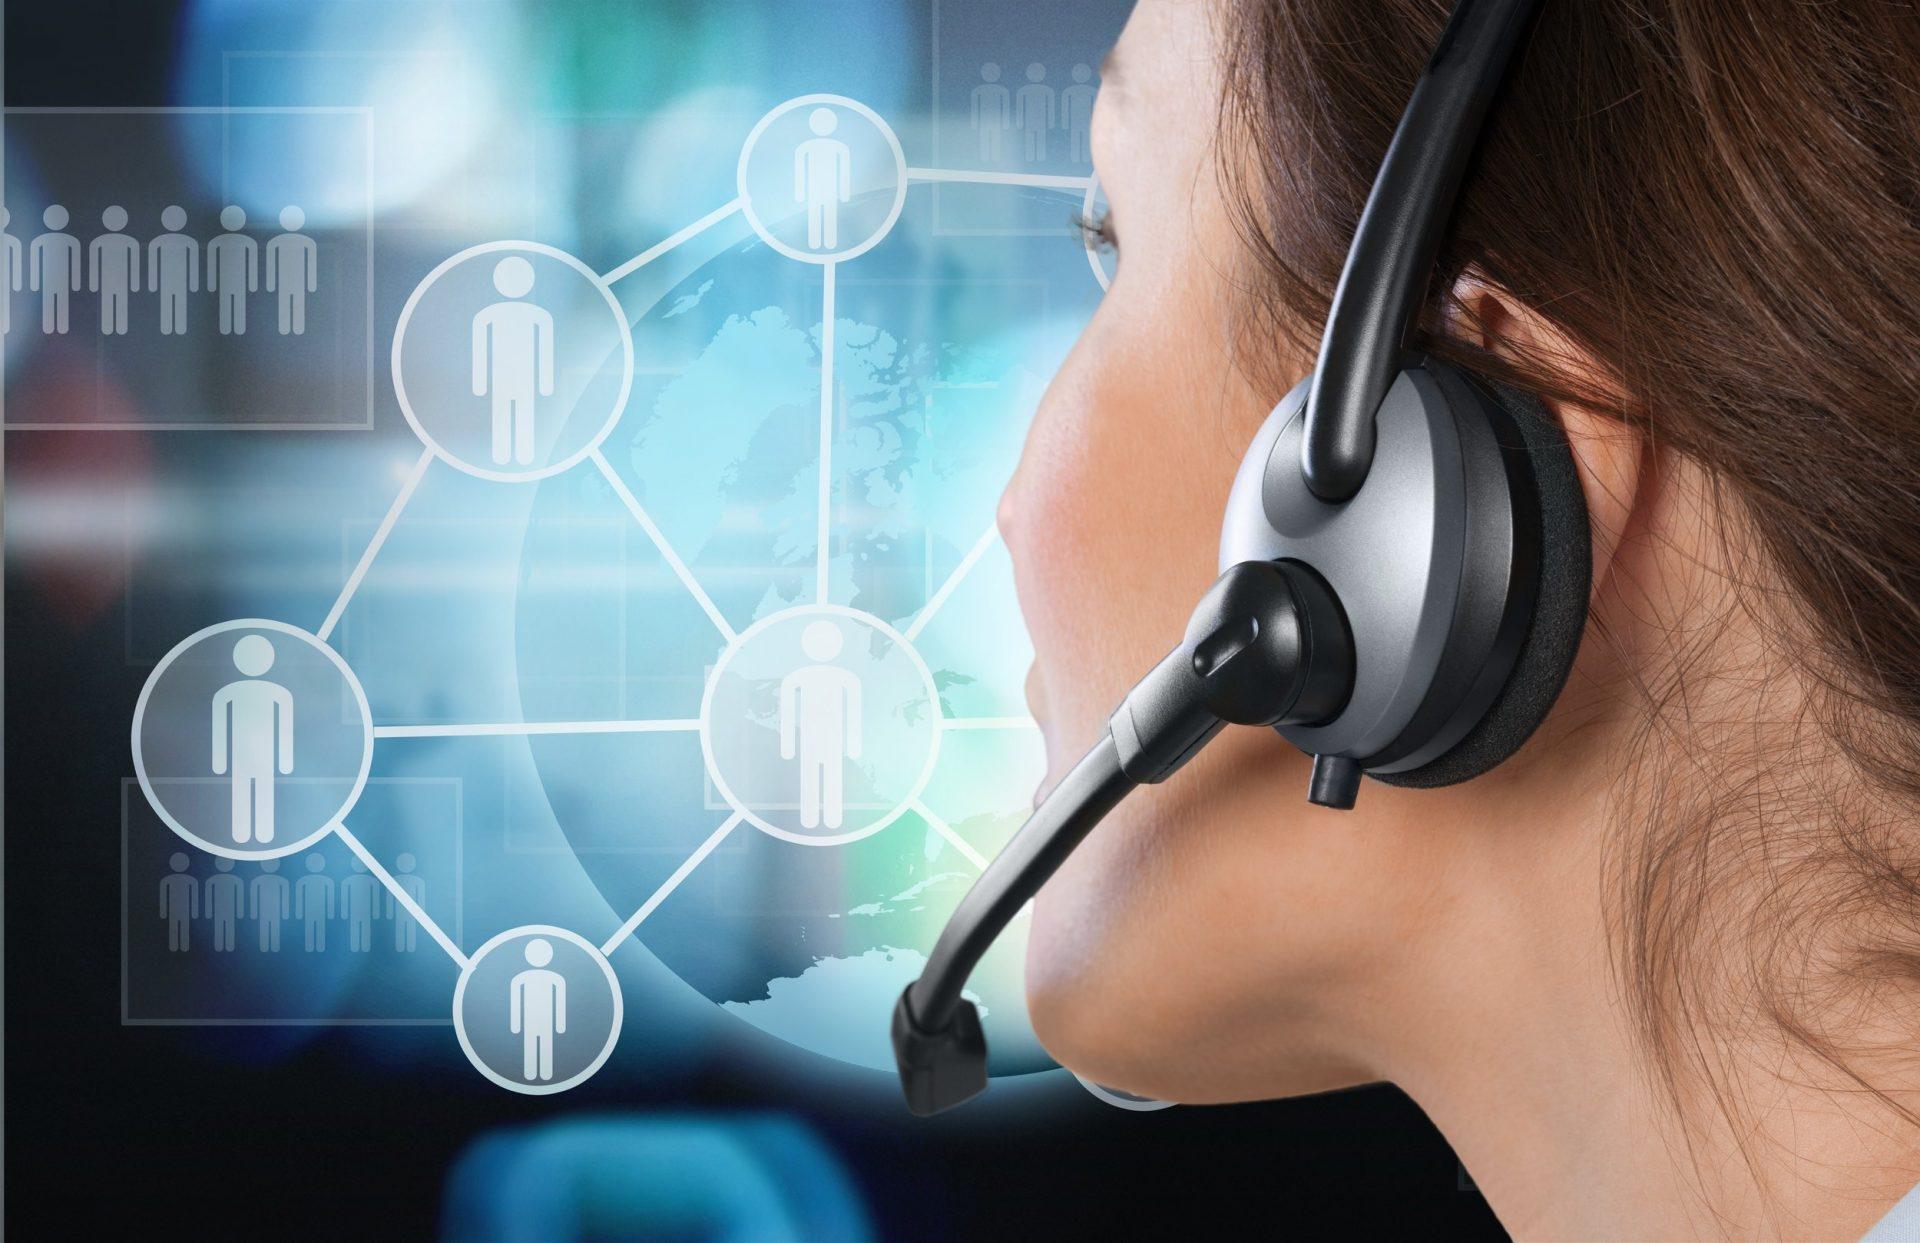 case study biuro obsługi klienta - Focus Desk w Focus Telecom Polska